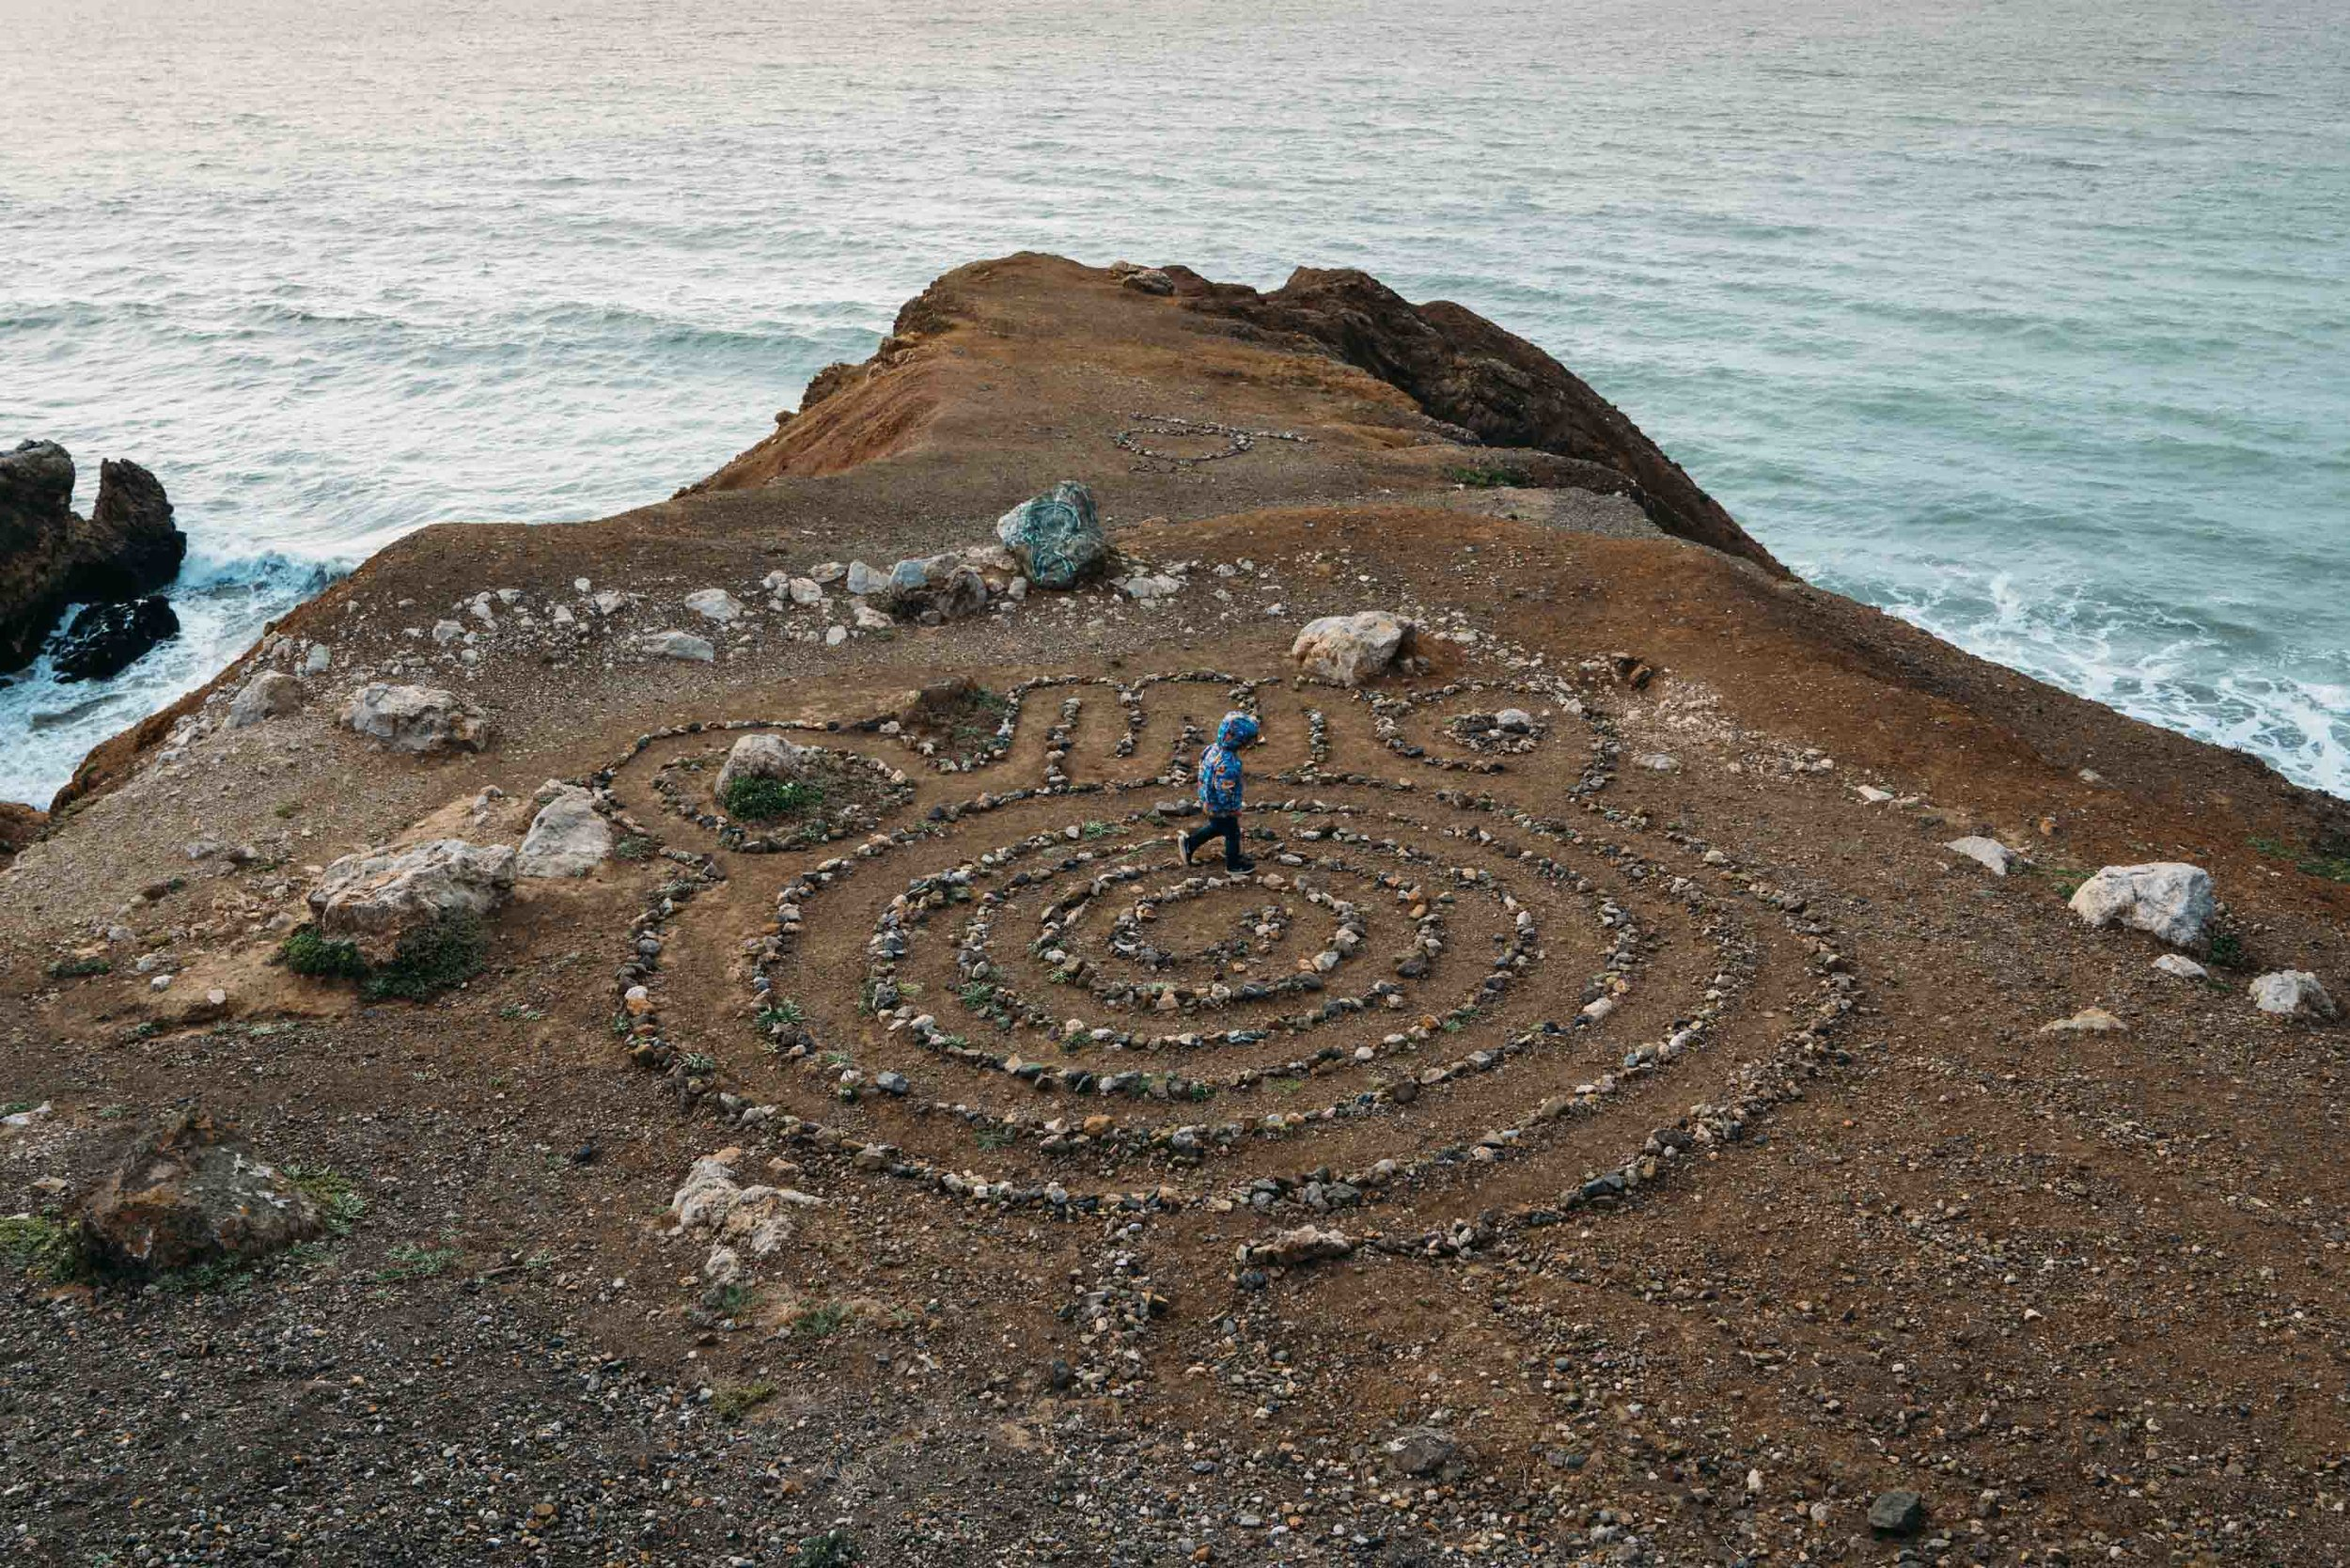 kyson-dana-rockaway-beach-nov-36.jpg